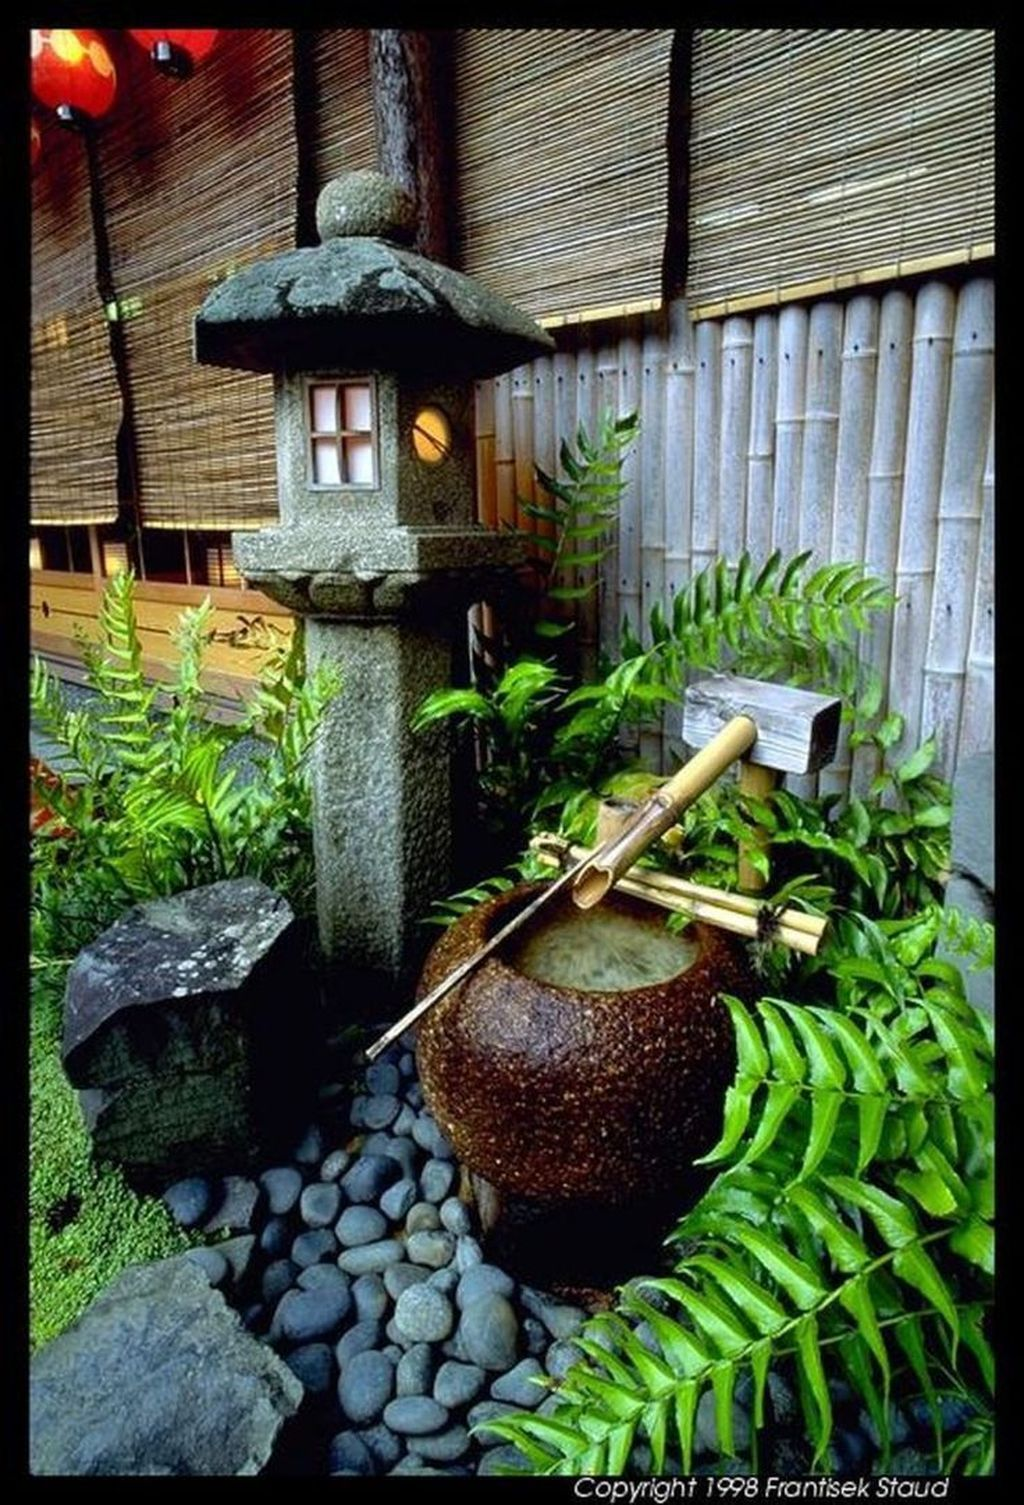 38 Lovely Meditation Garden Design Ideas Asiangarden 38 Lovely Meditation Garden Japanese Garden Landscape Small Japanese Garden Japanese Gardens Design Ideas